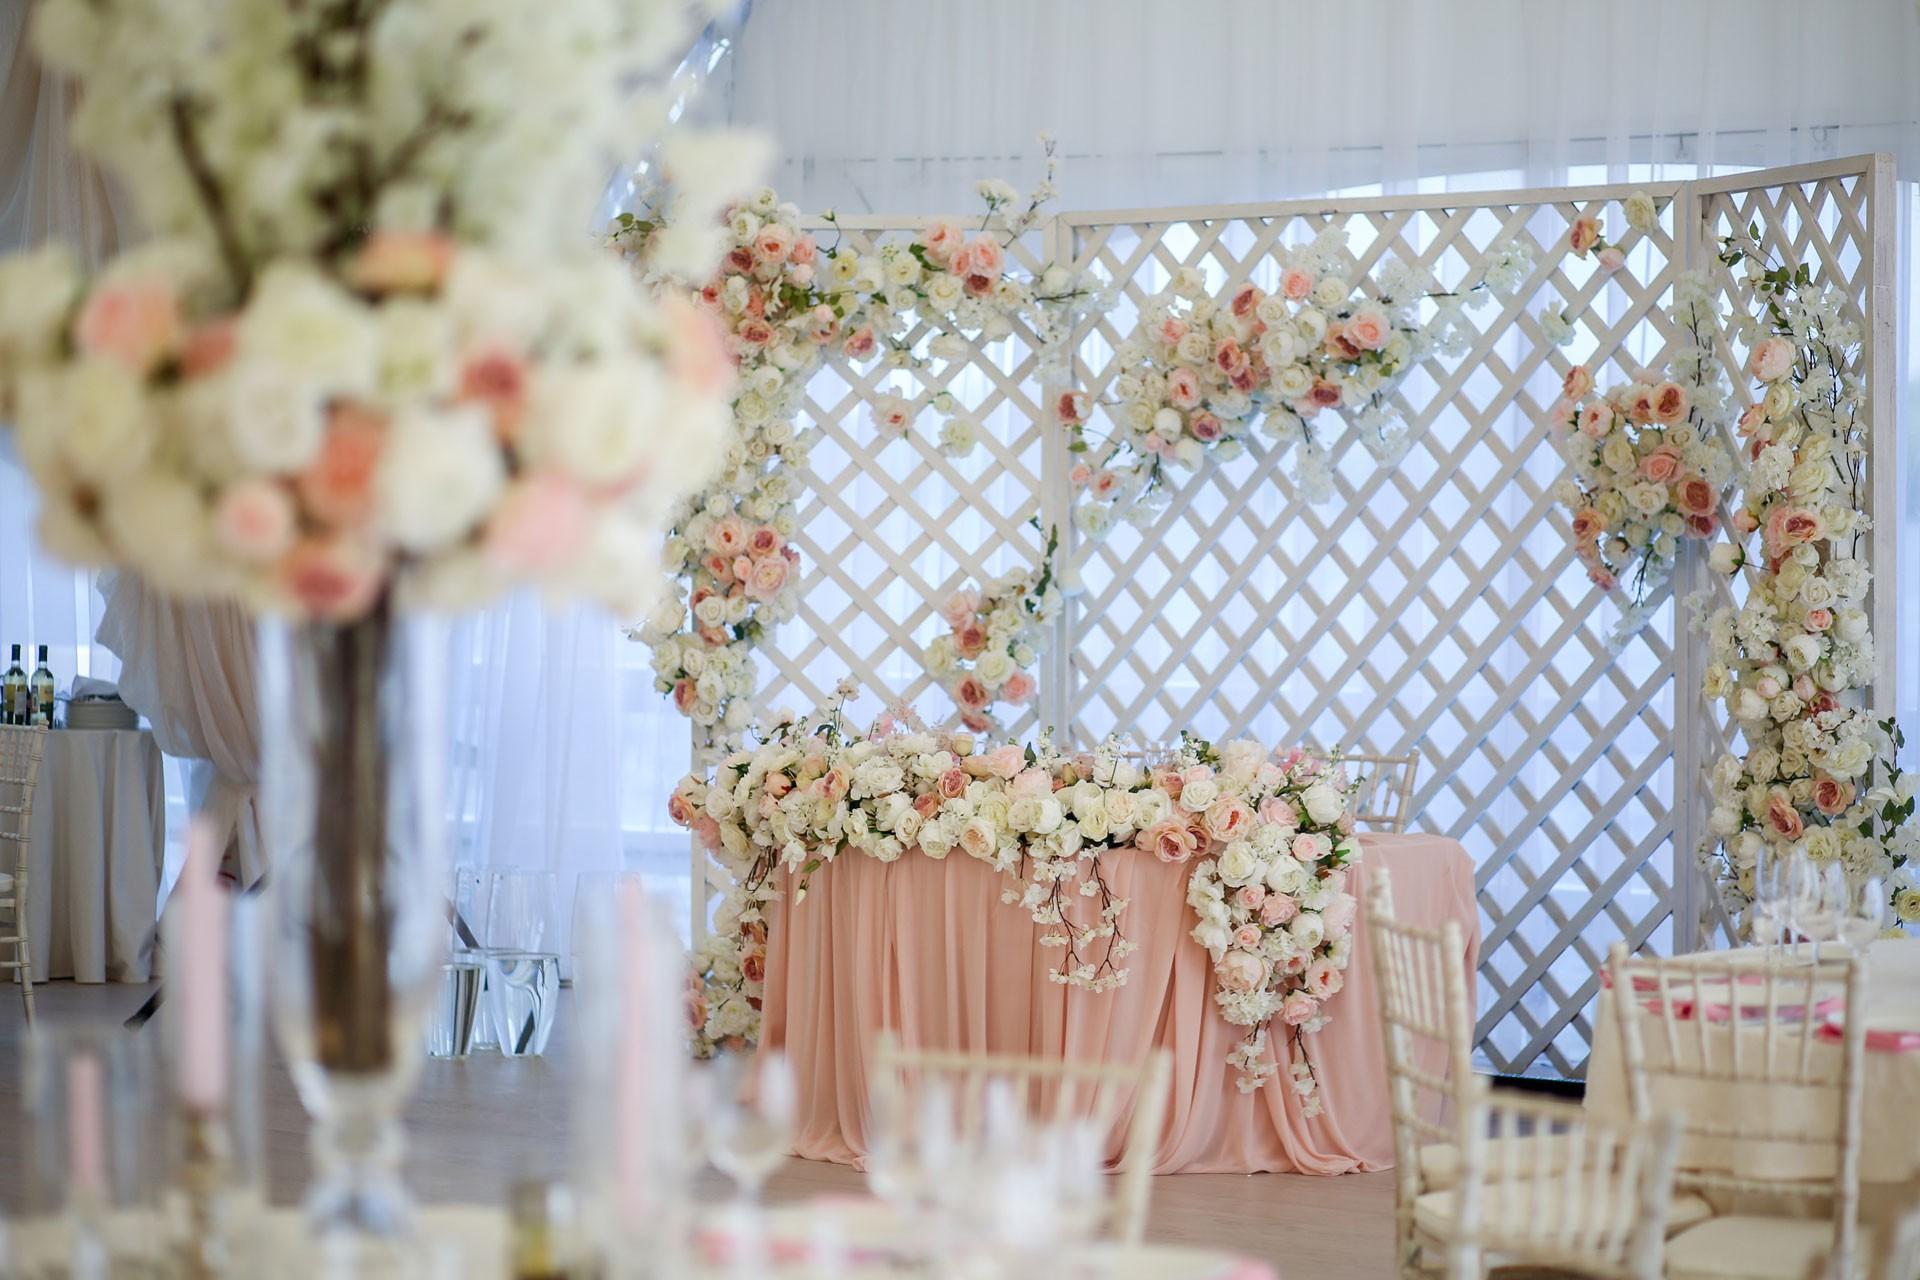 Вишневый сад. Свадьба Валентина Кротова и Натальи Ходуновой фото 7